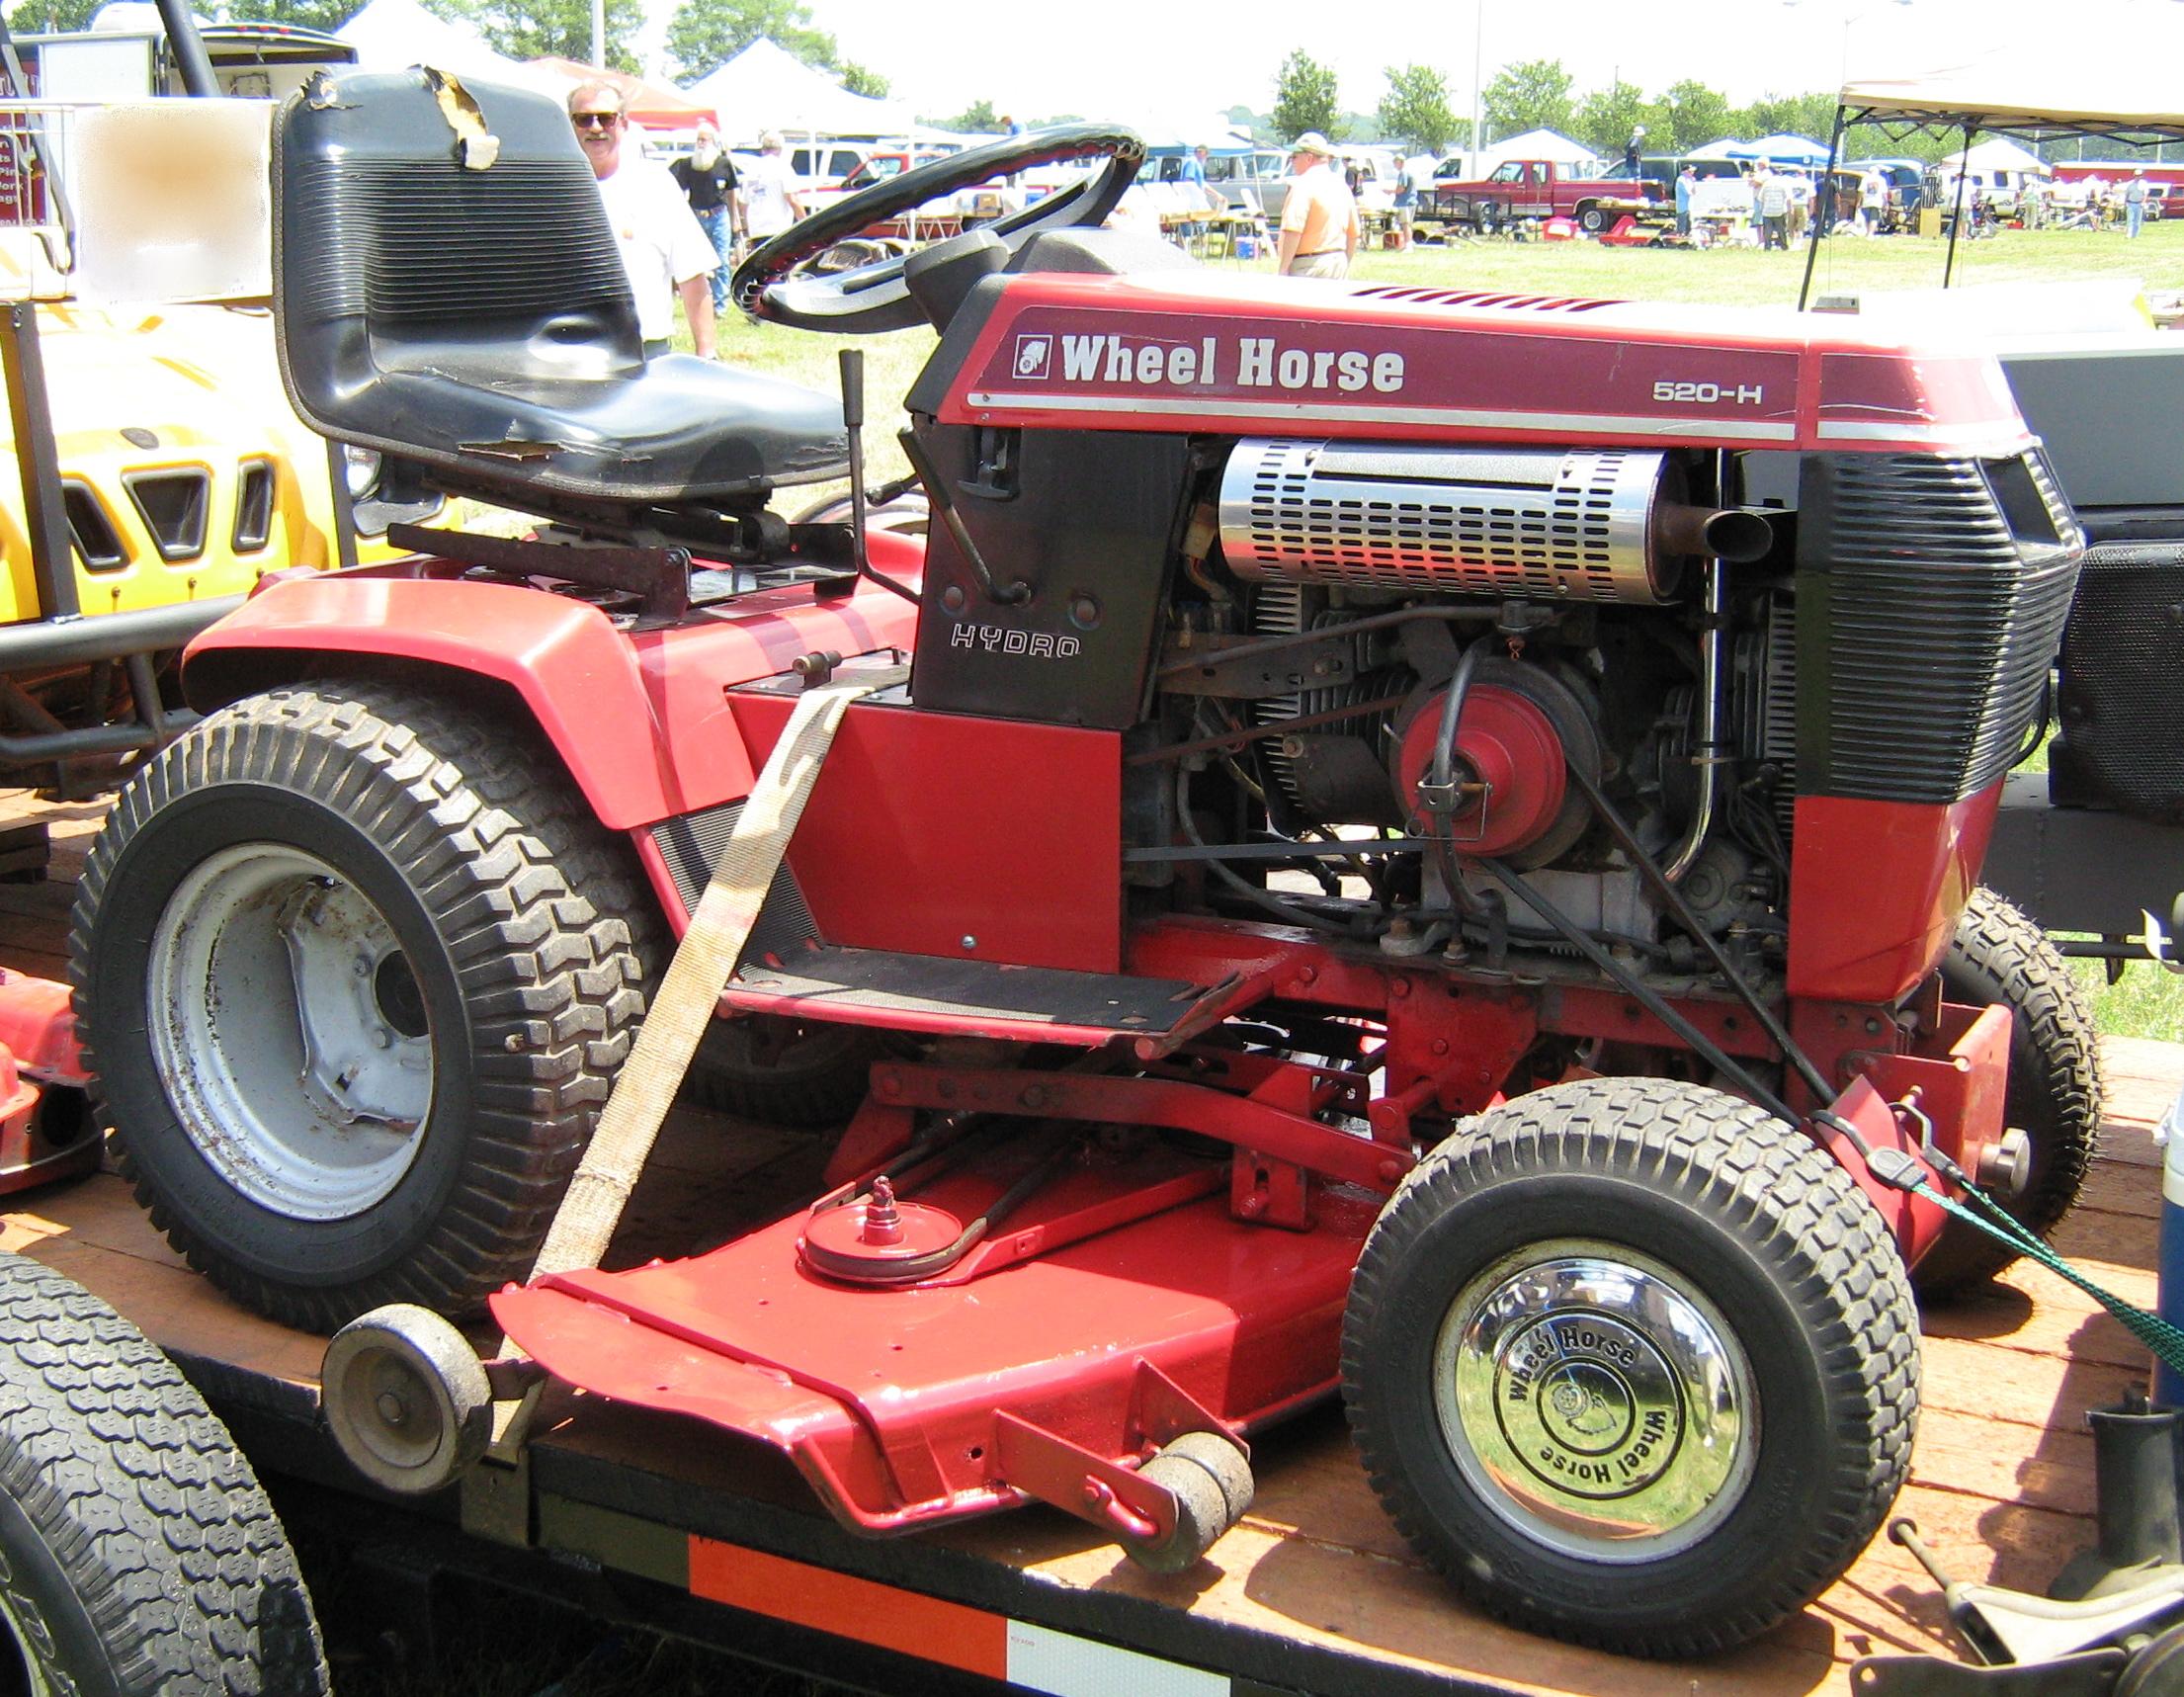 File:1986 Wheel Horse 520-H garden tractor-s jpg - Wikimedia